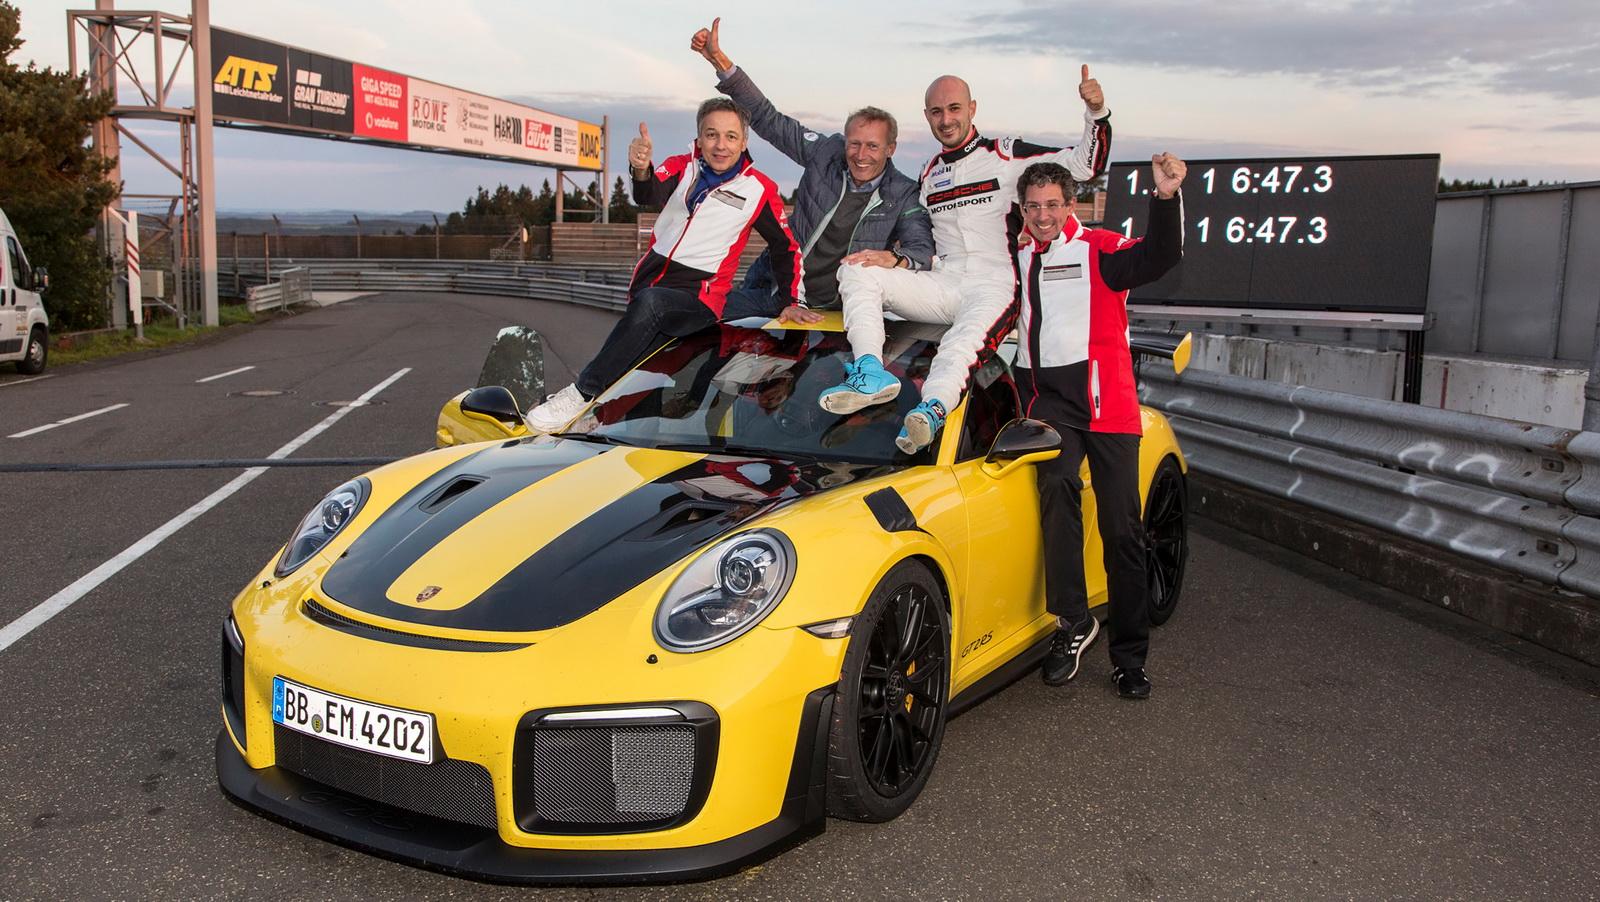 2018-porsche-911-gt2-rs-nurburgring-record-7